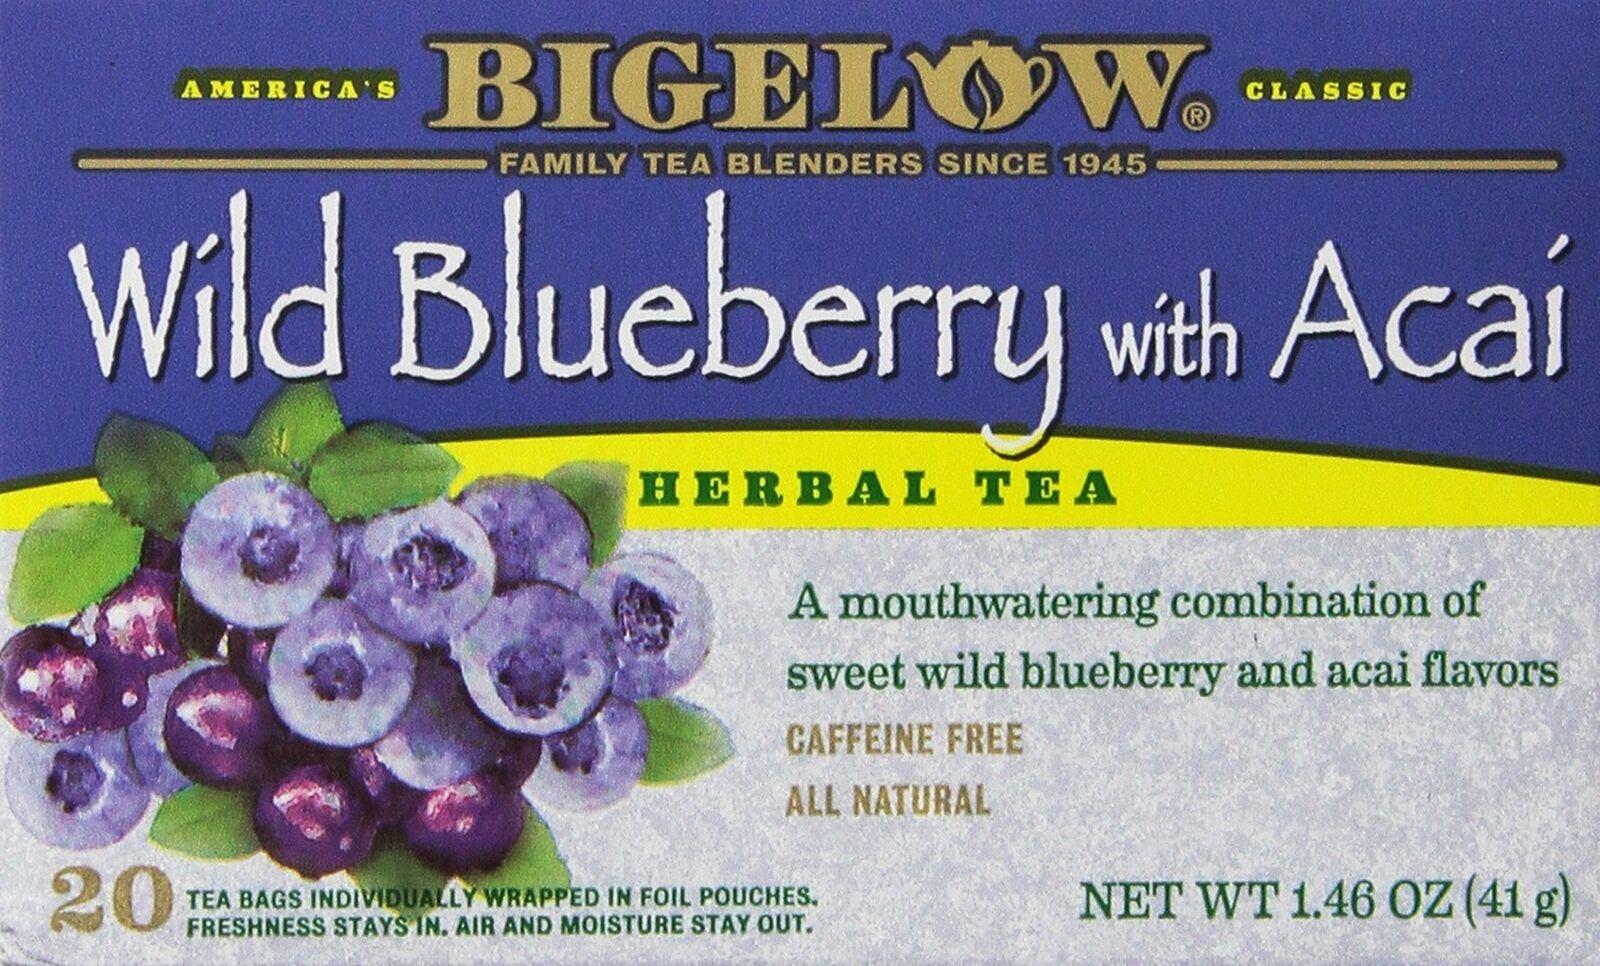 Bigelow Herbal Tea Wild Blueberry With Acai 20 CT